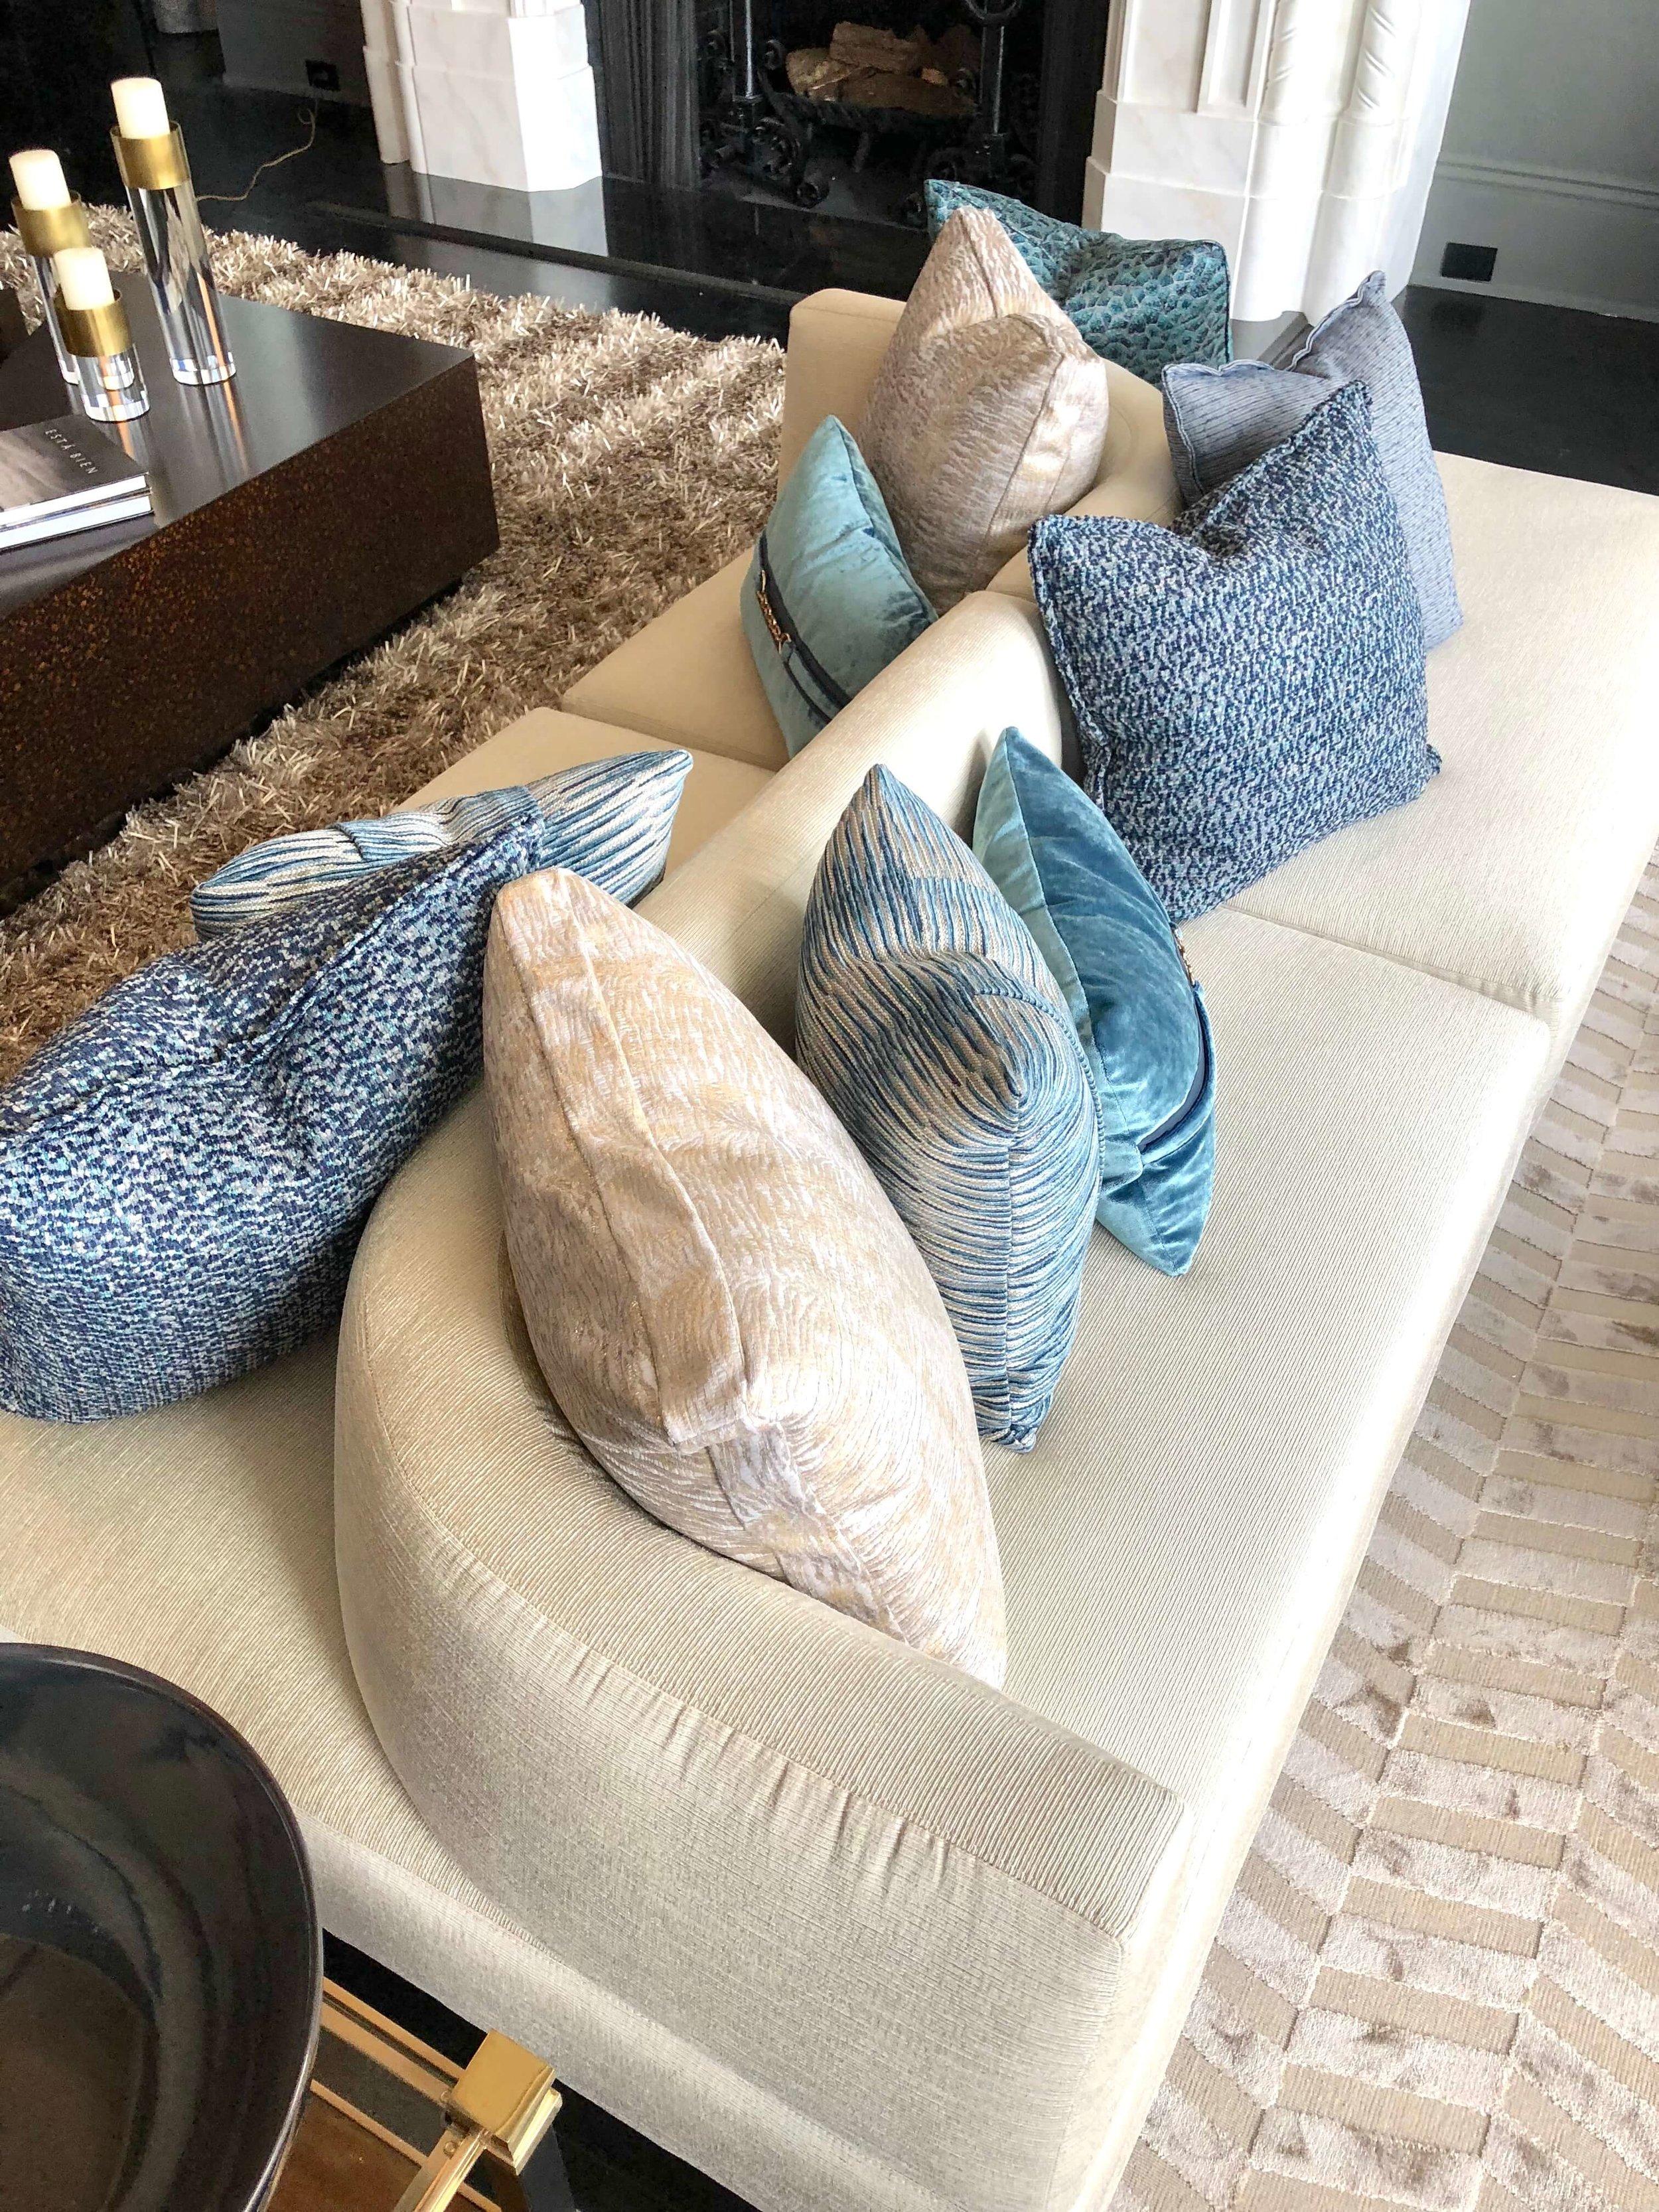 Back to back contemporary sofa in living room designed by Designs of the Interior in the Pasadena Showcase House of Design 2018 #sofa #livingroomideas #livingroom #backtobacksofa